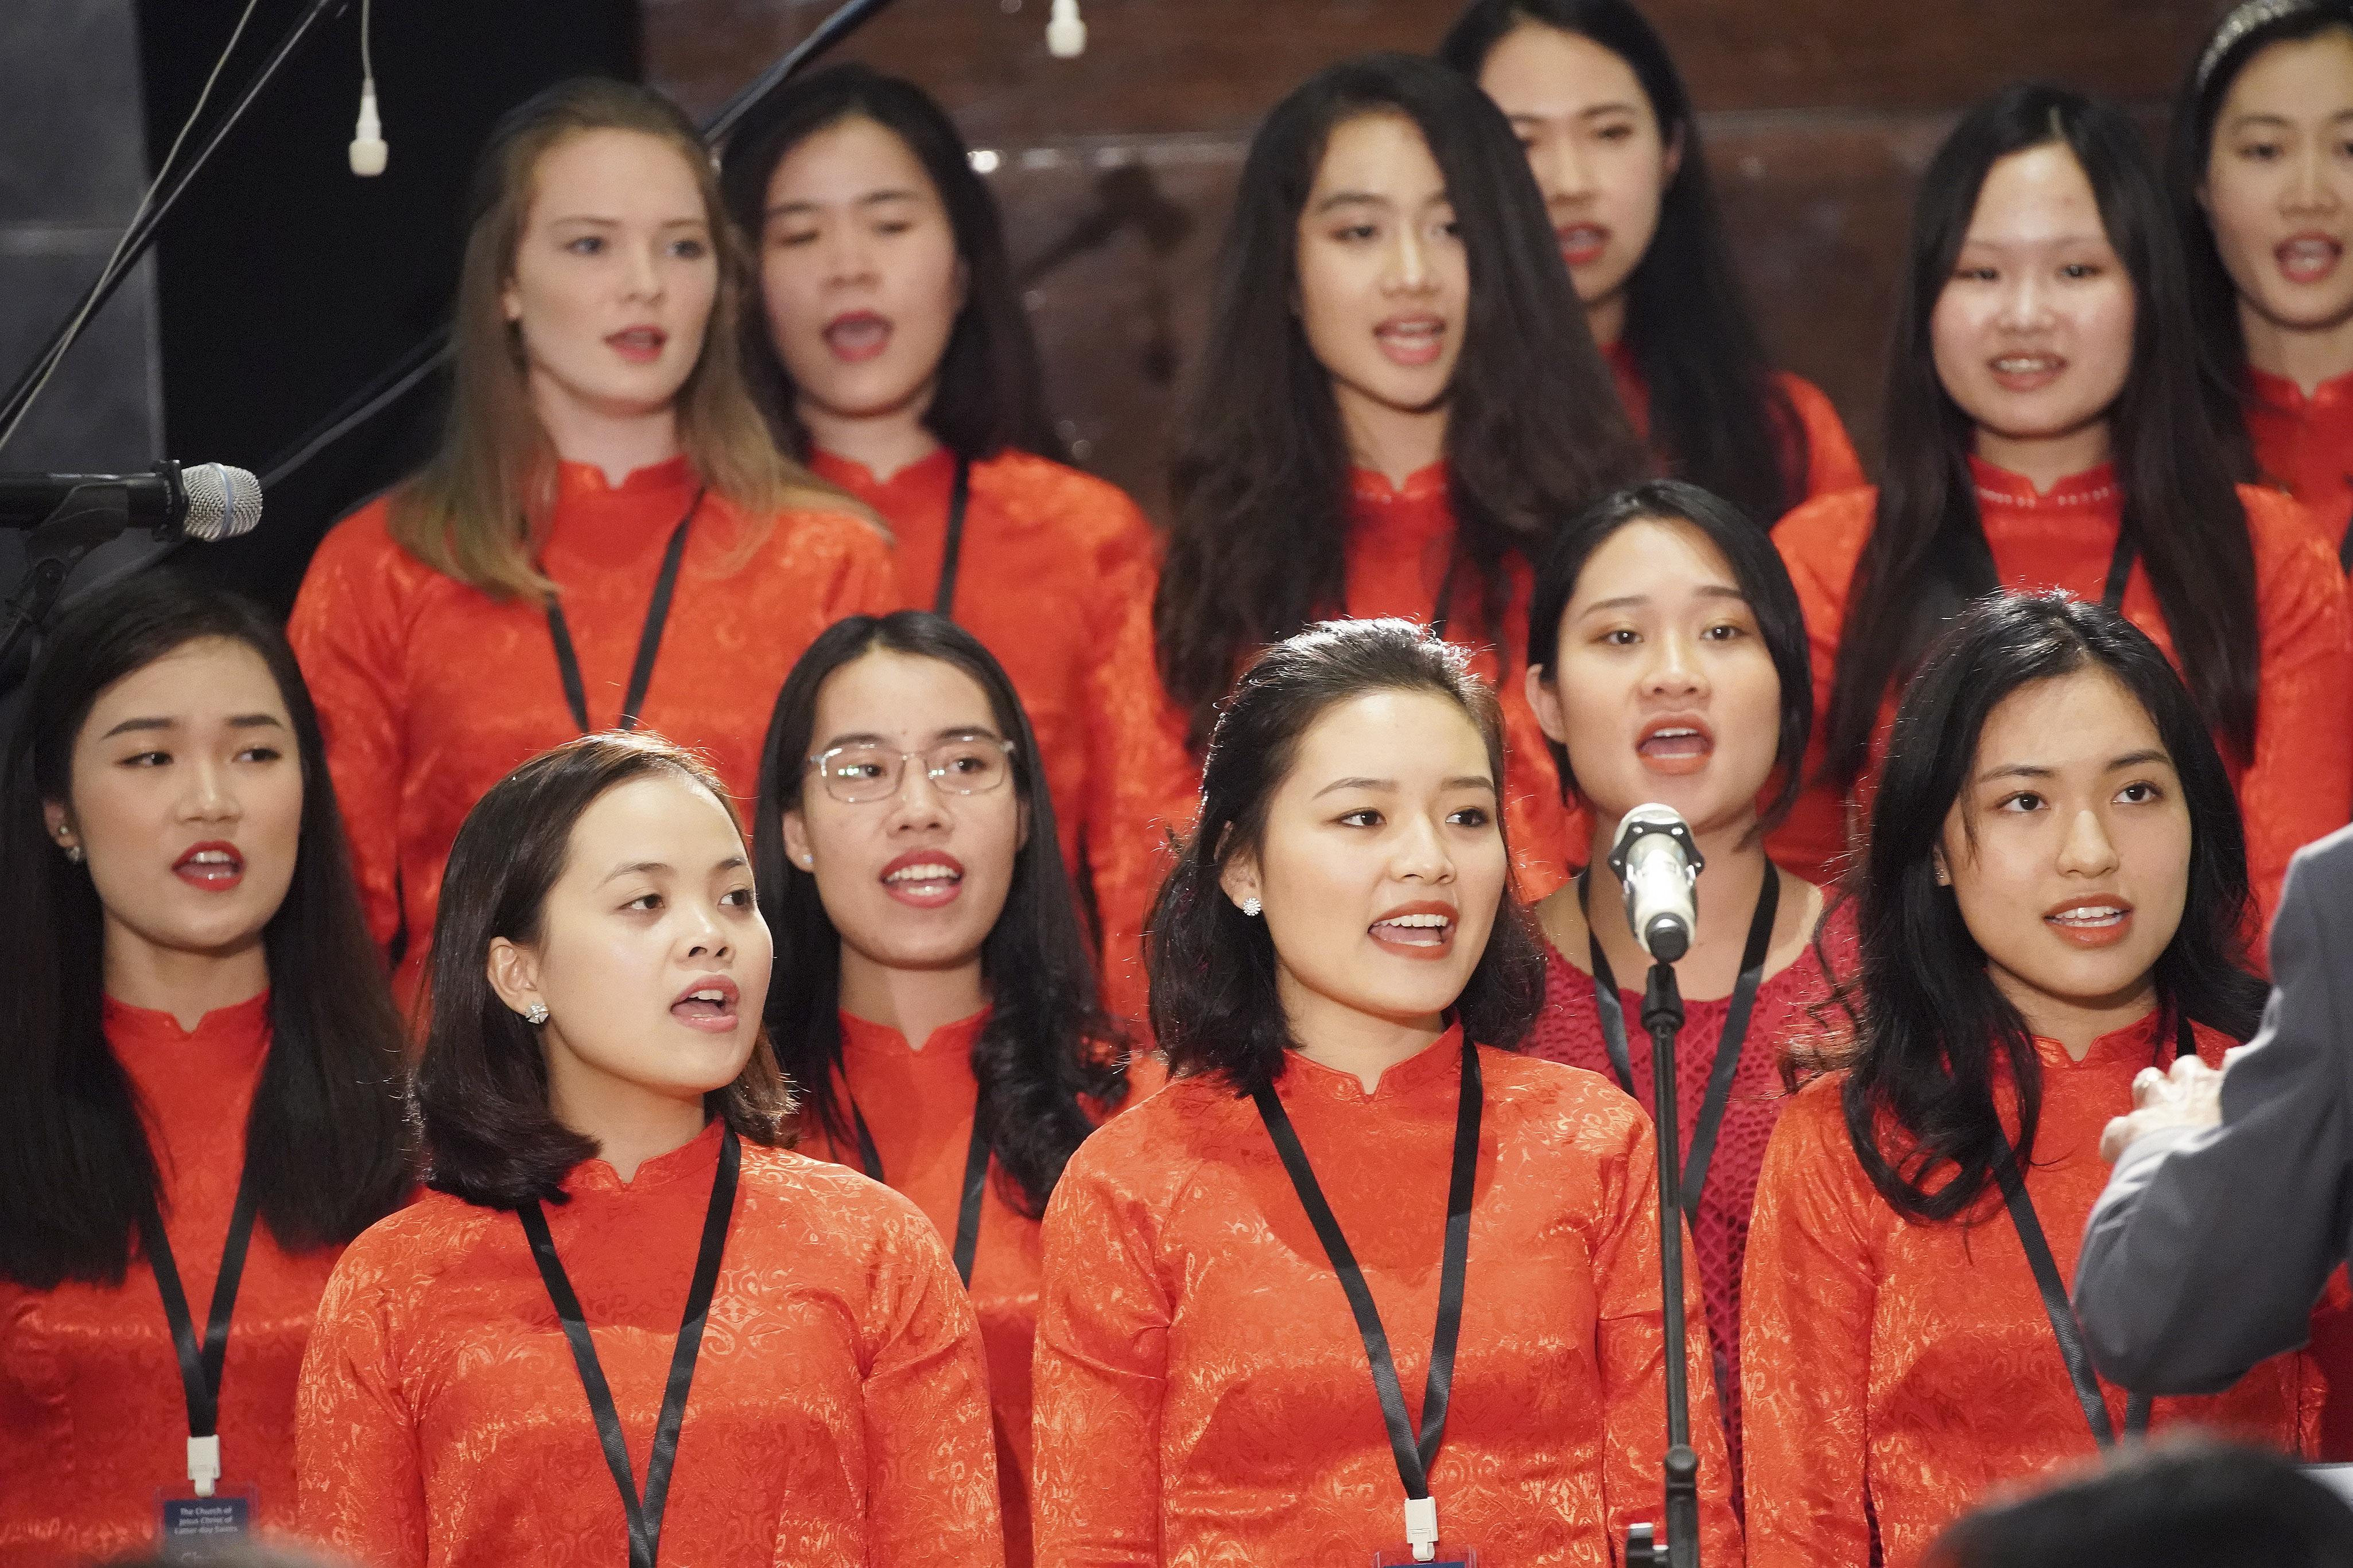 A choir sing during a devotional in Hanoi, Vietnam, on Sunday, Nov. 17, 2019.